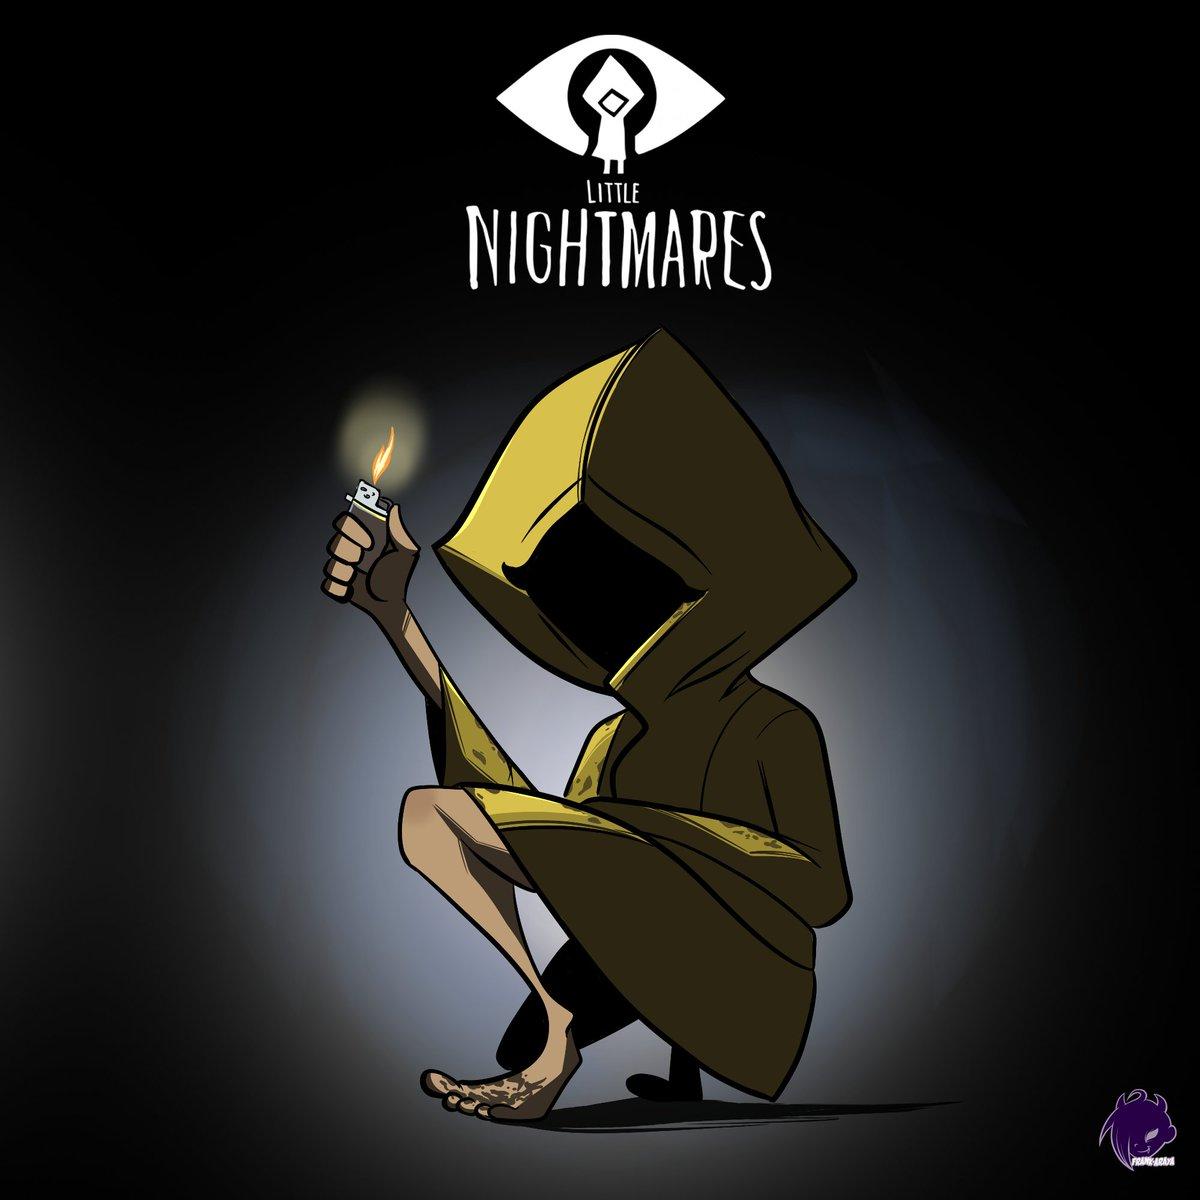 I'm playing Little Nightmares  #littlenightmares #littlenightmaresfanart #videogames pic.twitter.com/CqO1wp9cGQ